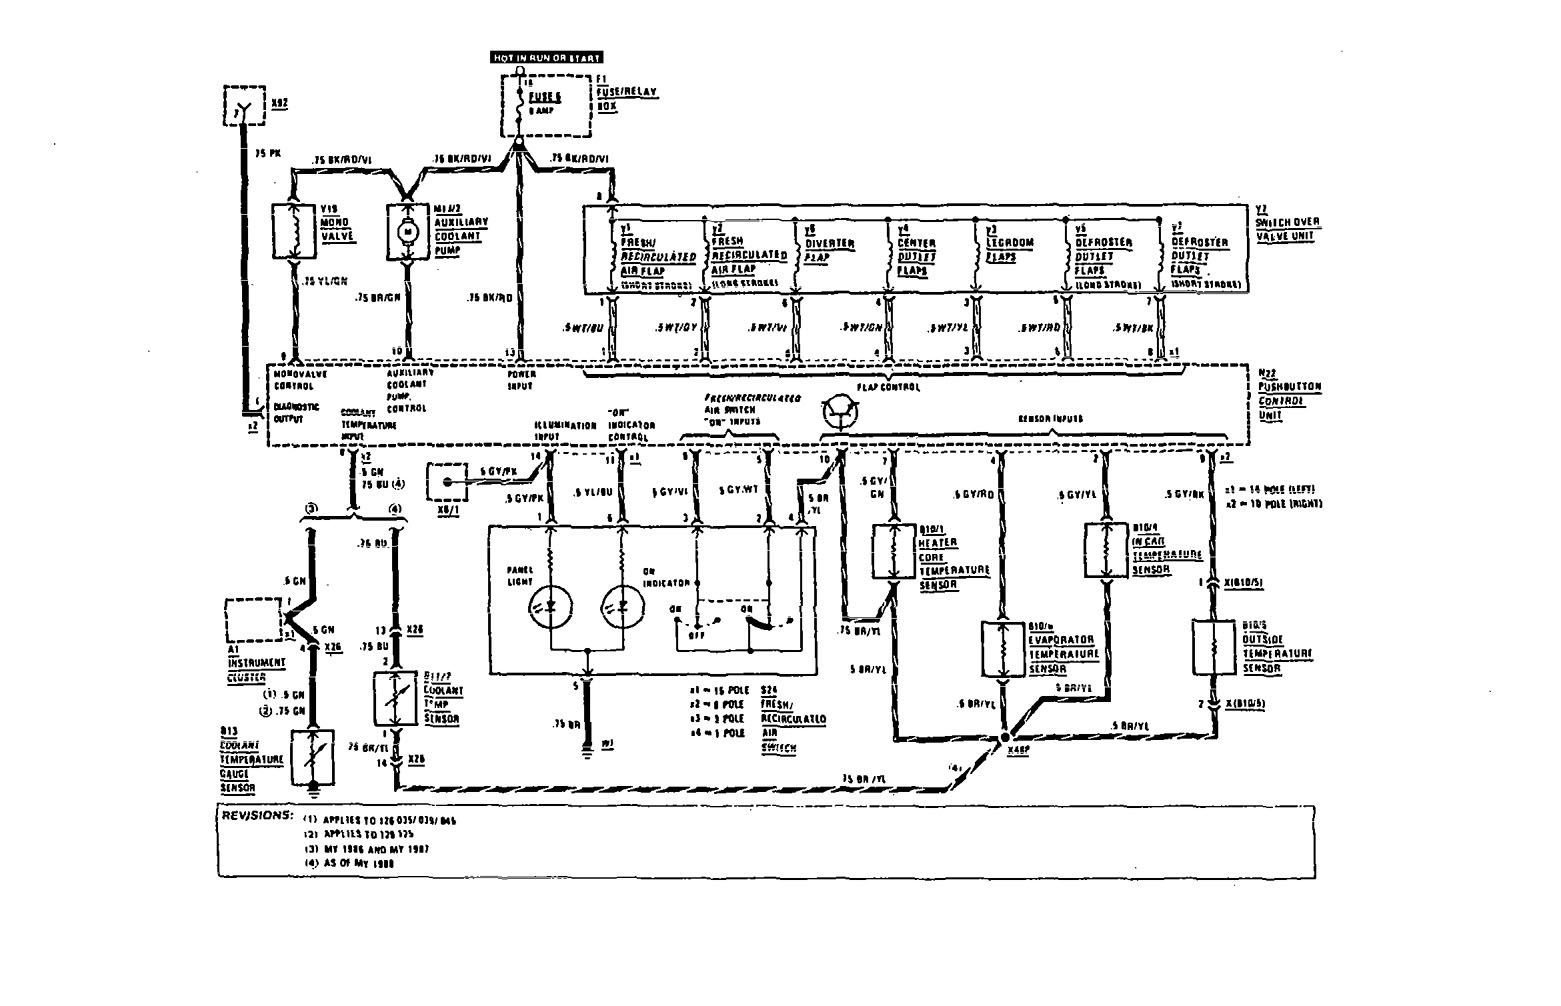 Wiring Diagram Mercedes 560 Sec